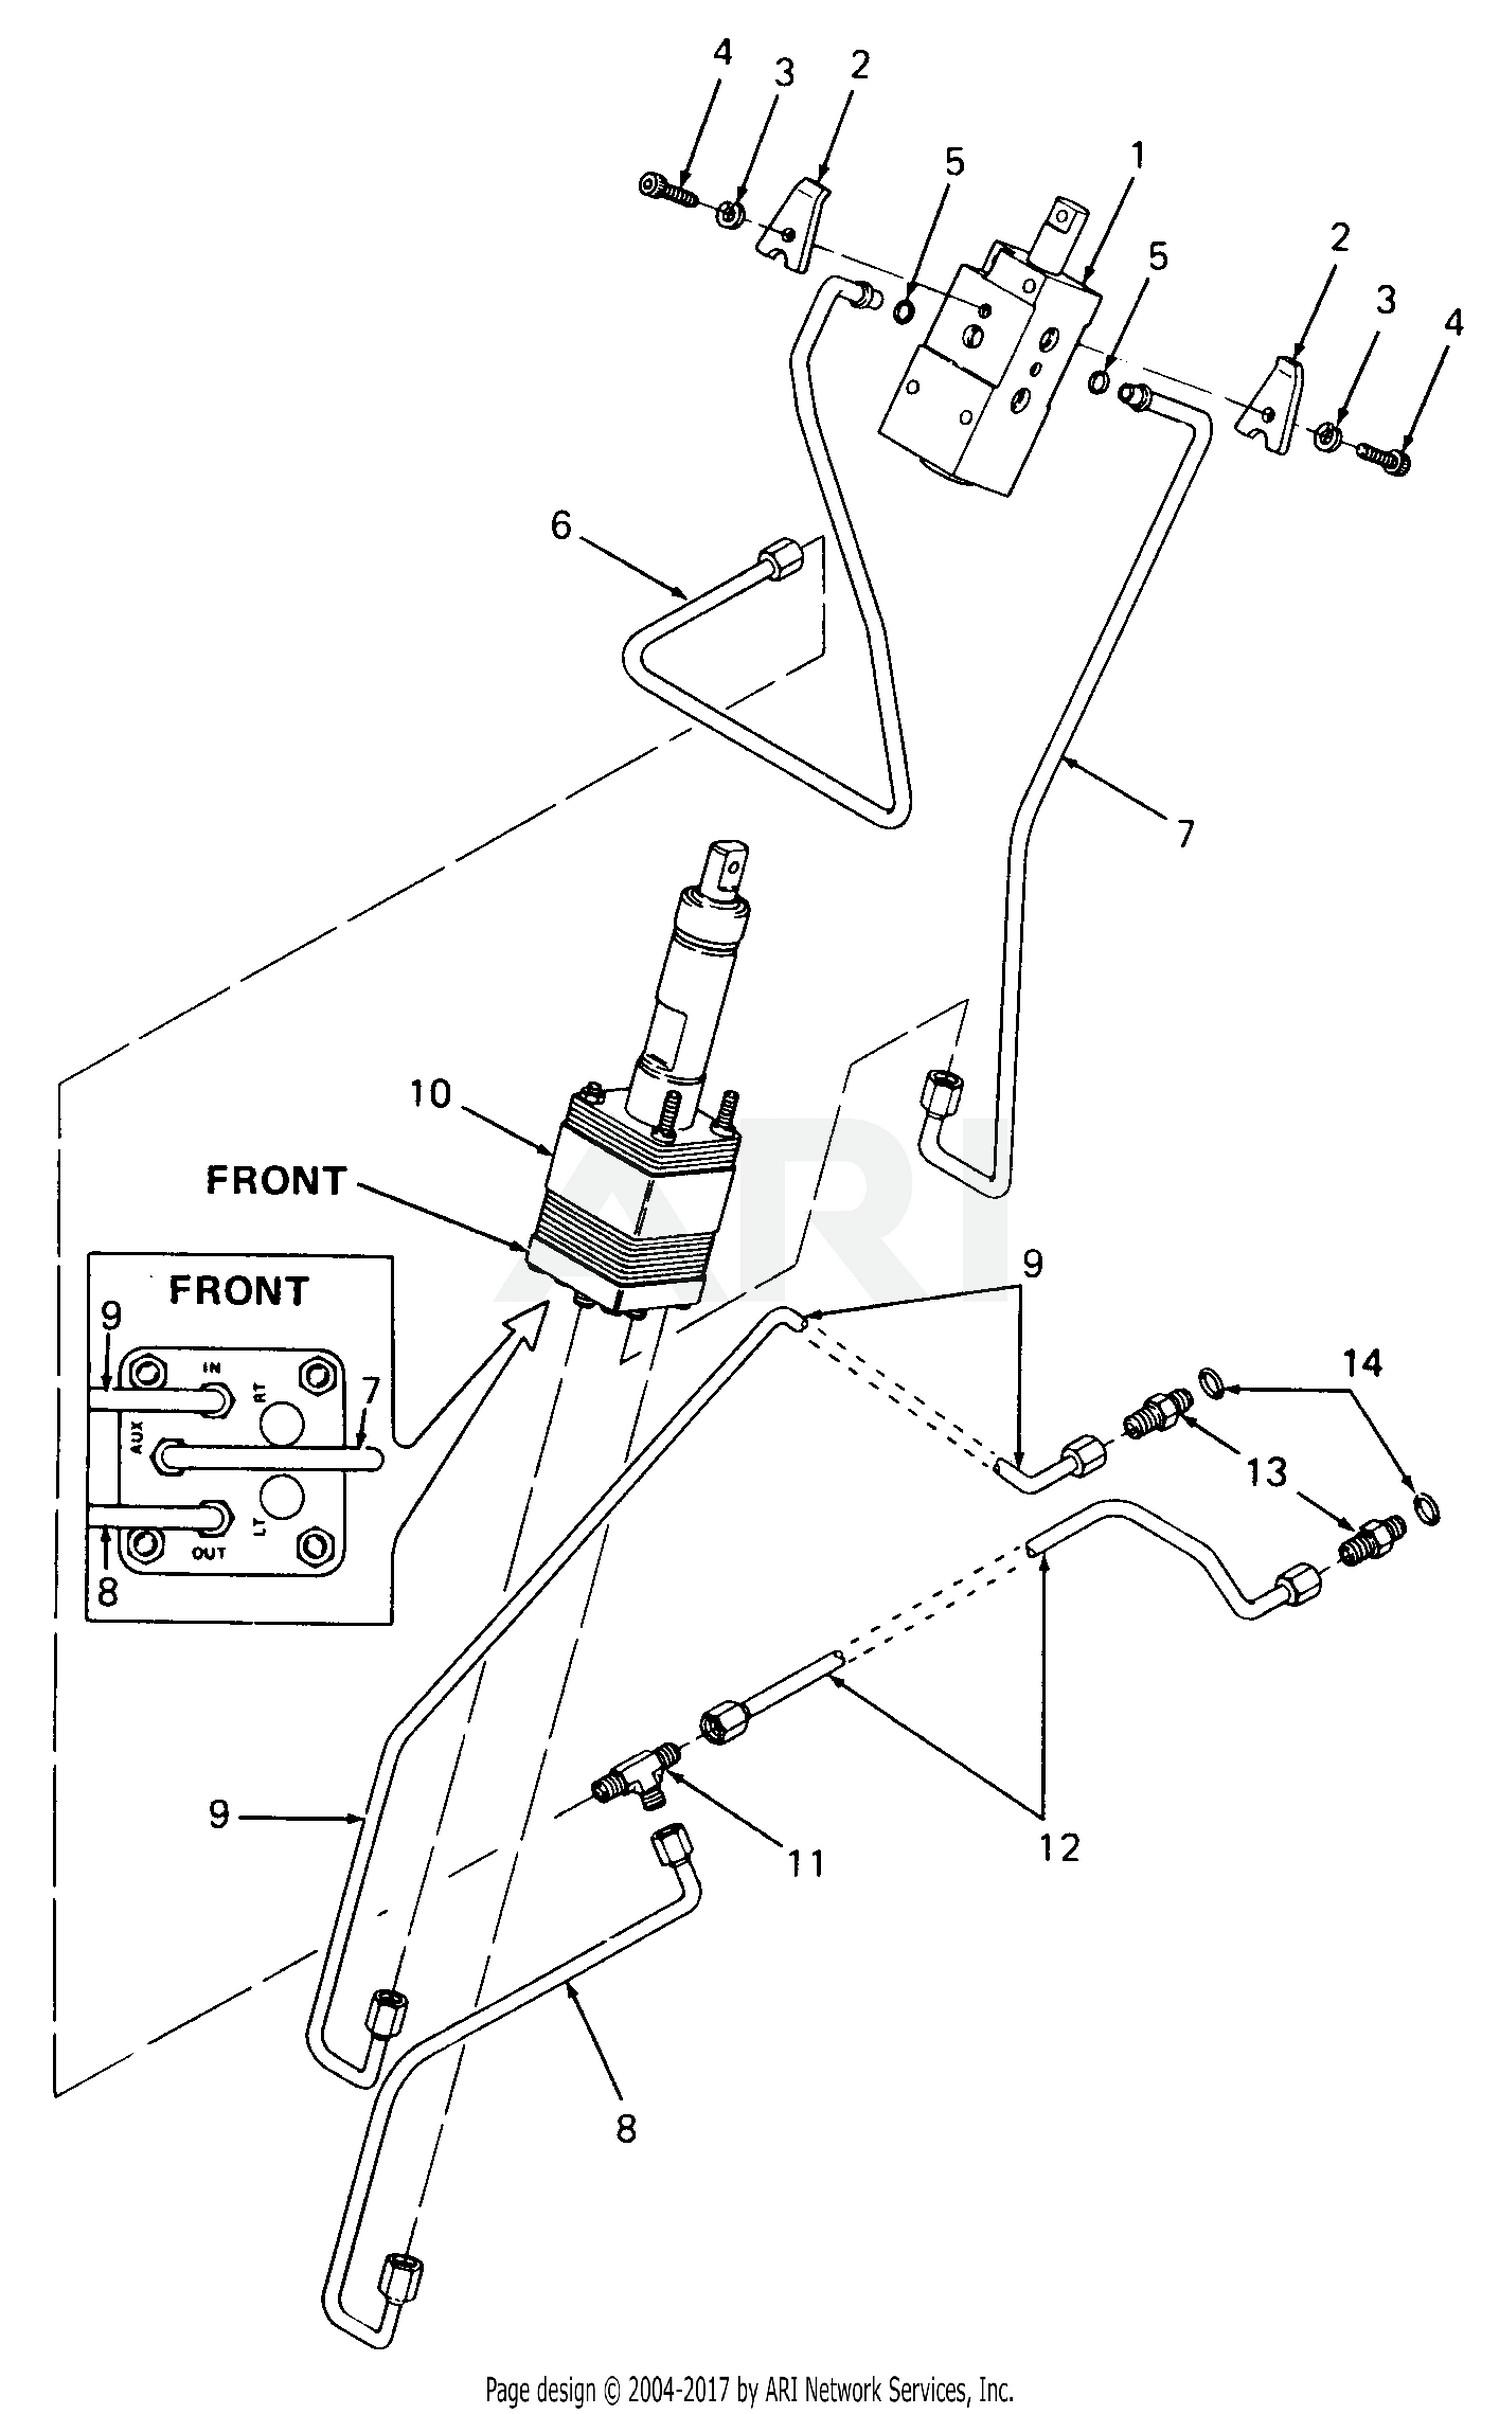 Power Steering Line Diagram Cub Cadet Parts Diagrams Cub Cadet 1862 S N 821 060 836 000 142 Of Power Steering Line Diagram